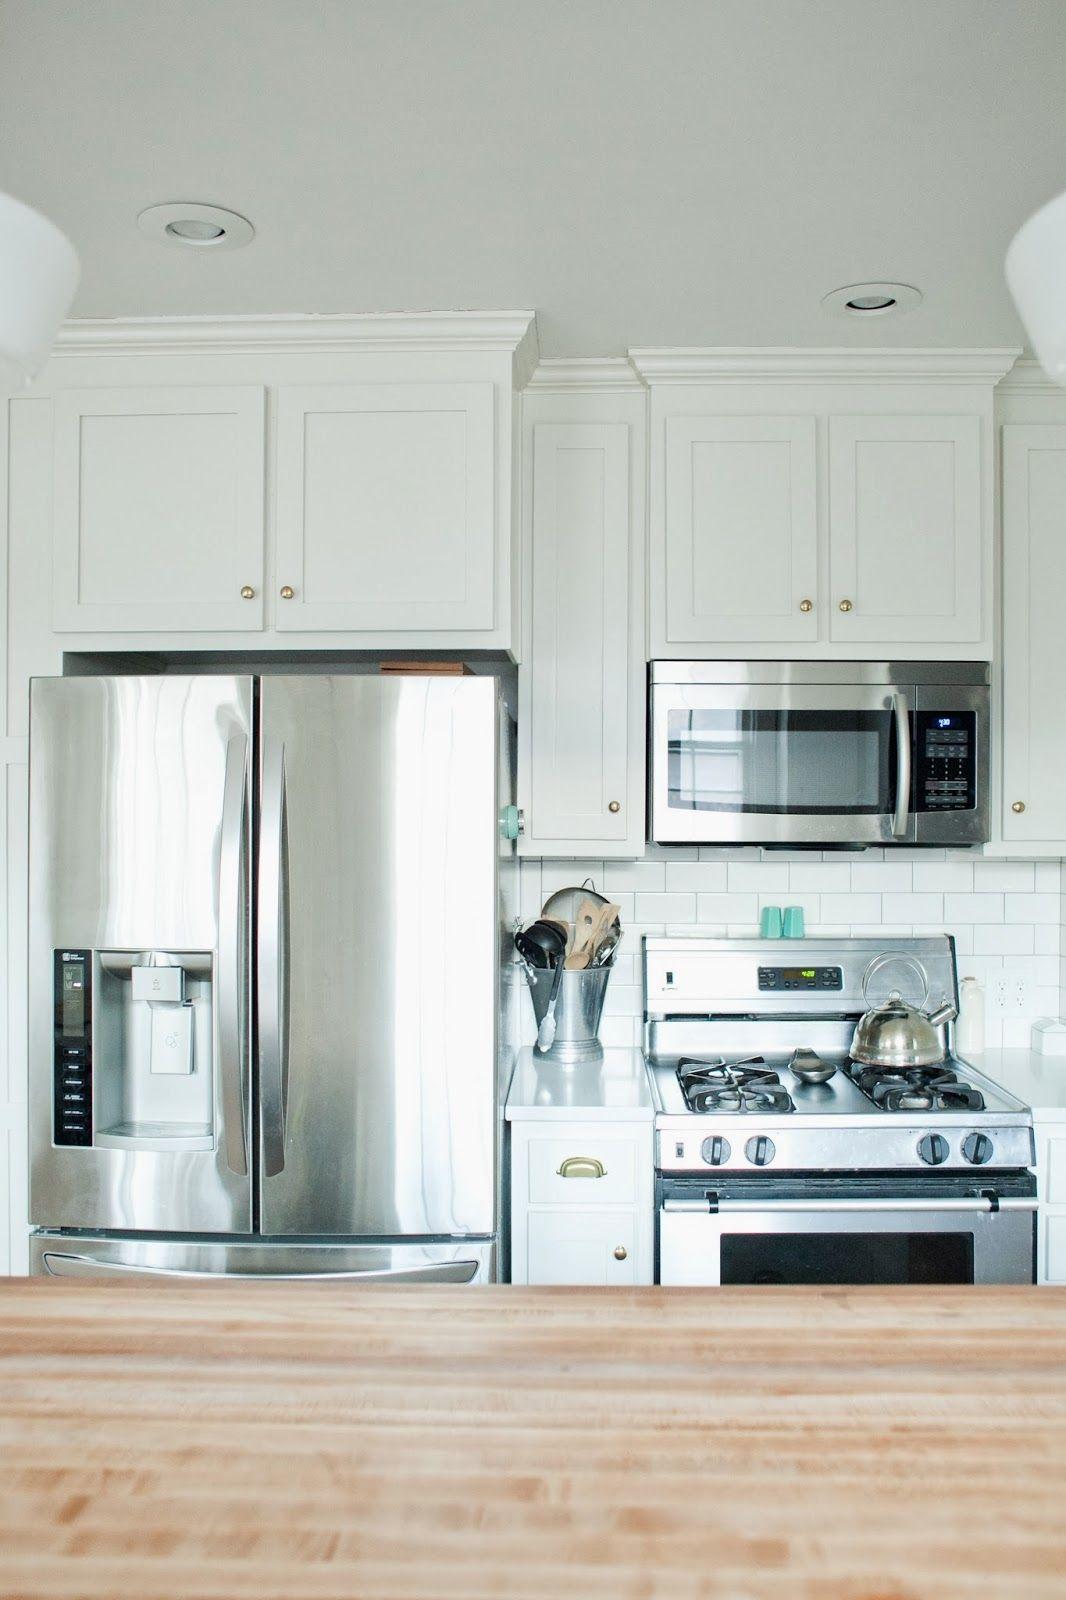 Kitchen Design Wall Oven Next To Refrigerator